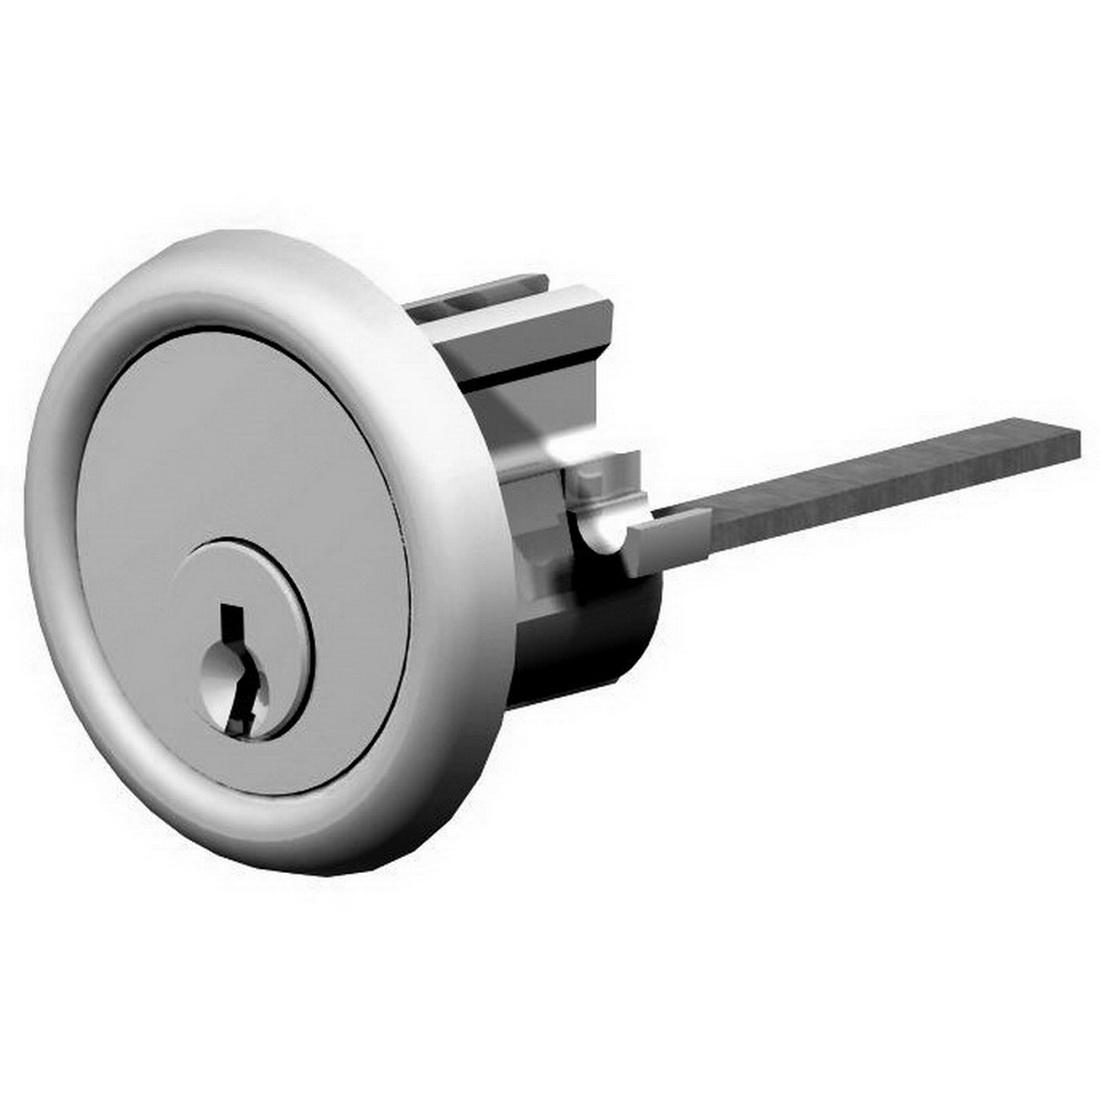 Assa Abloy  Night Latch Replacement 6-Pin Rim Cylinder Satin Chrome MC17SC